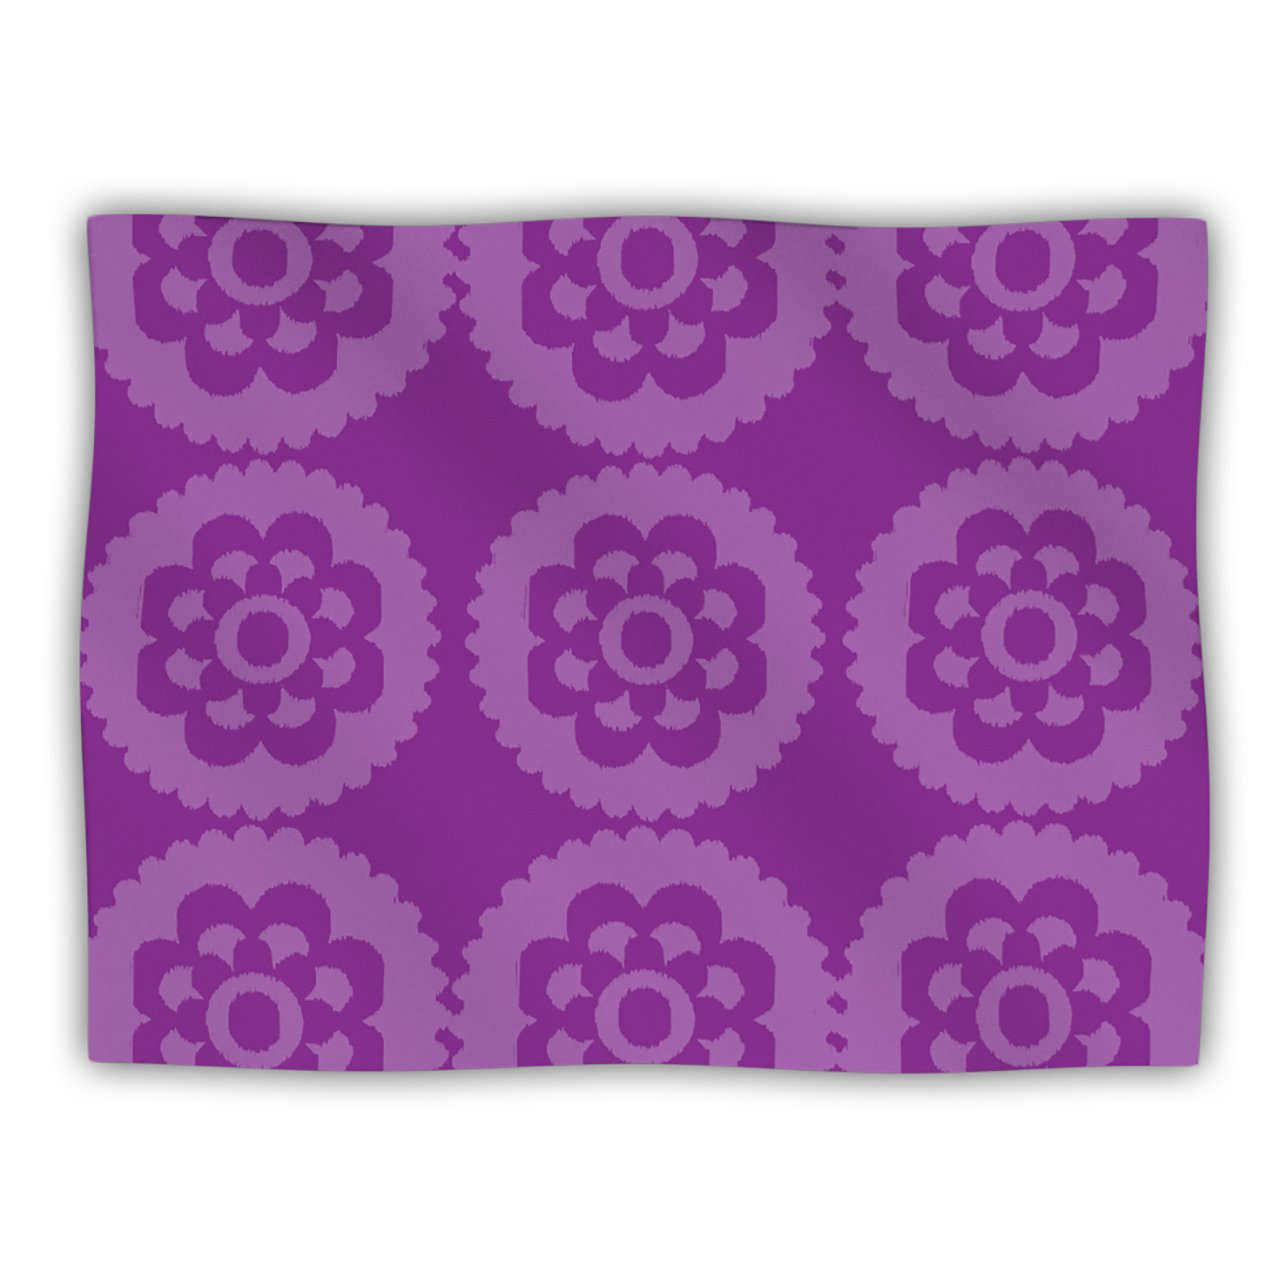 Kess InHouse Nicole Ketchum 'Moroccan Purple' Dog Blanket, 40 by 30-Inch